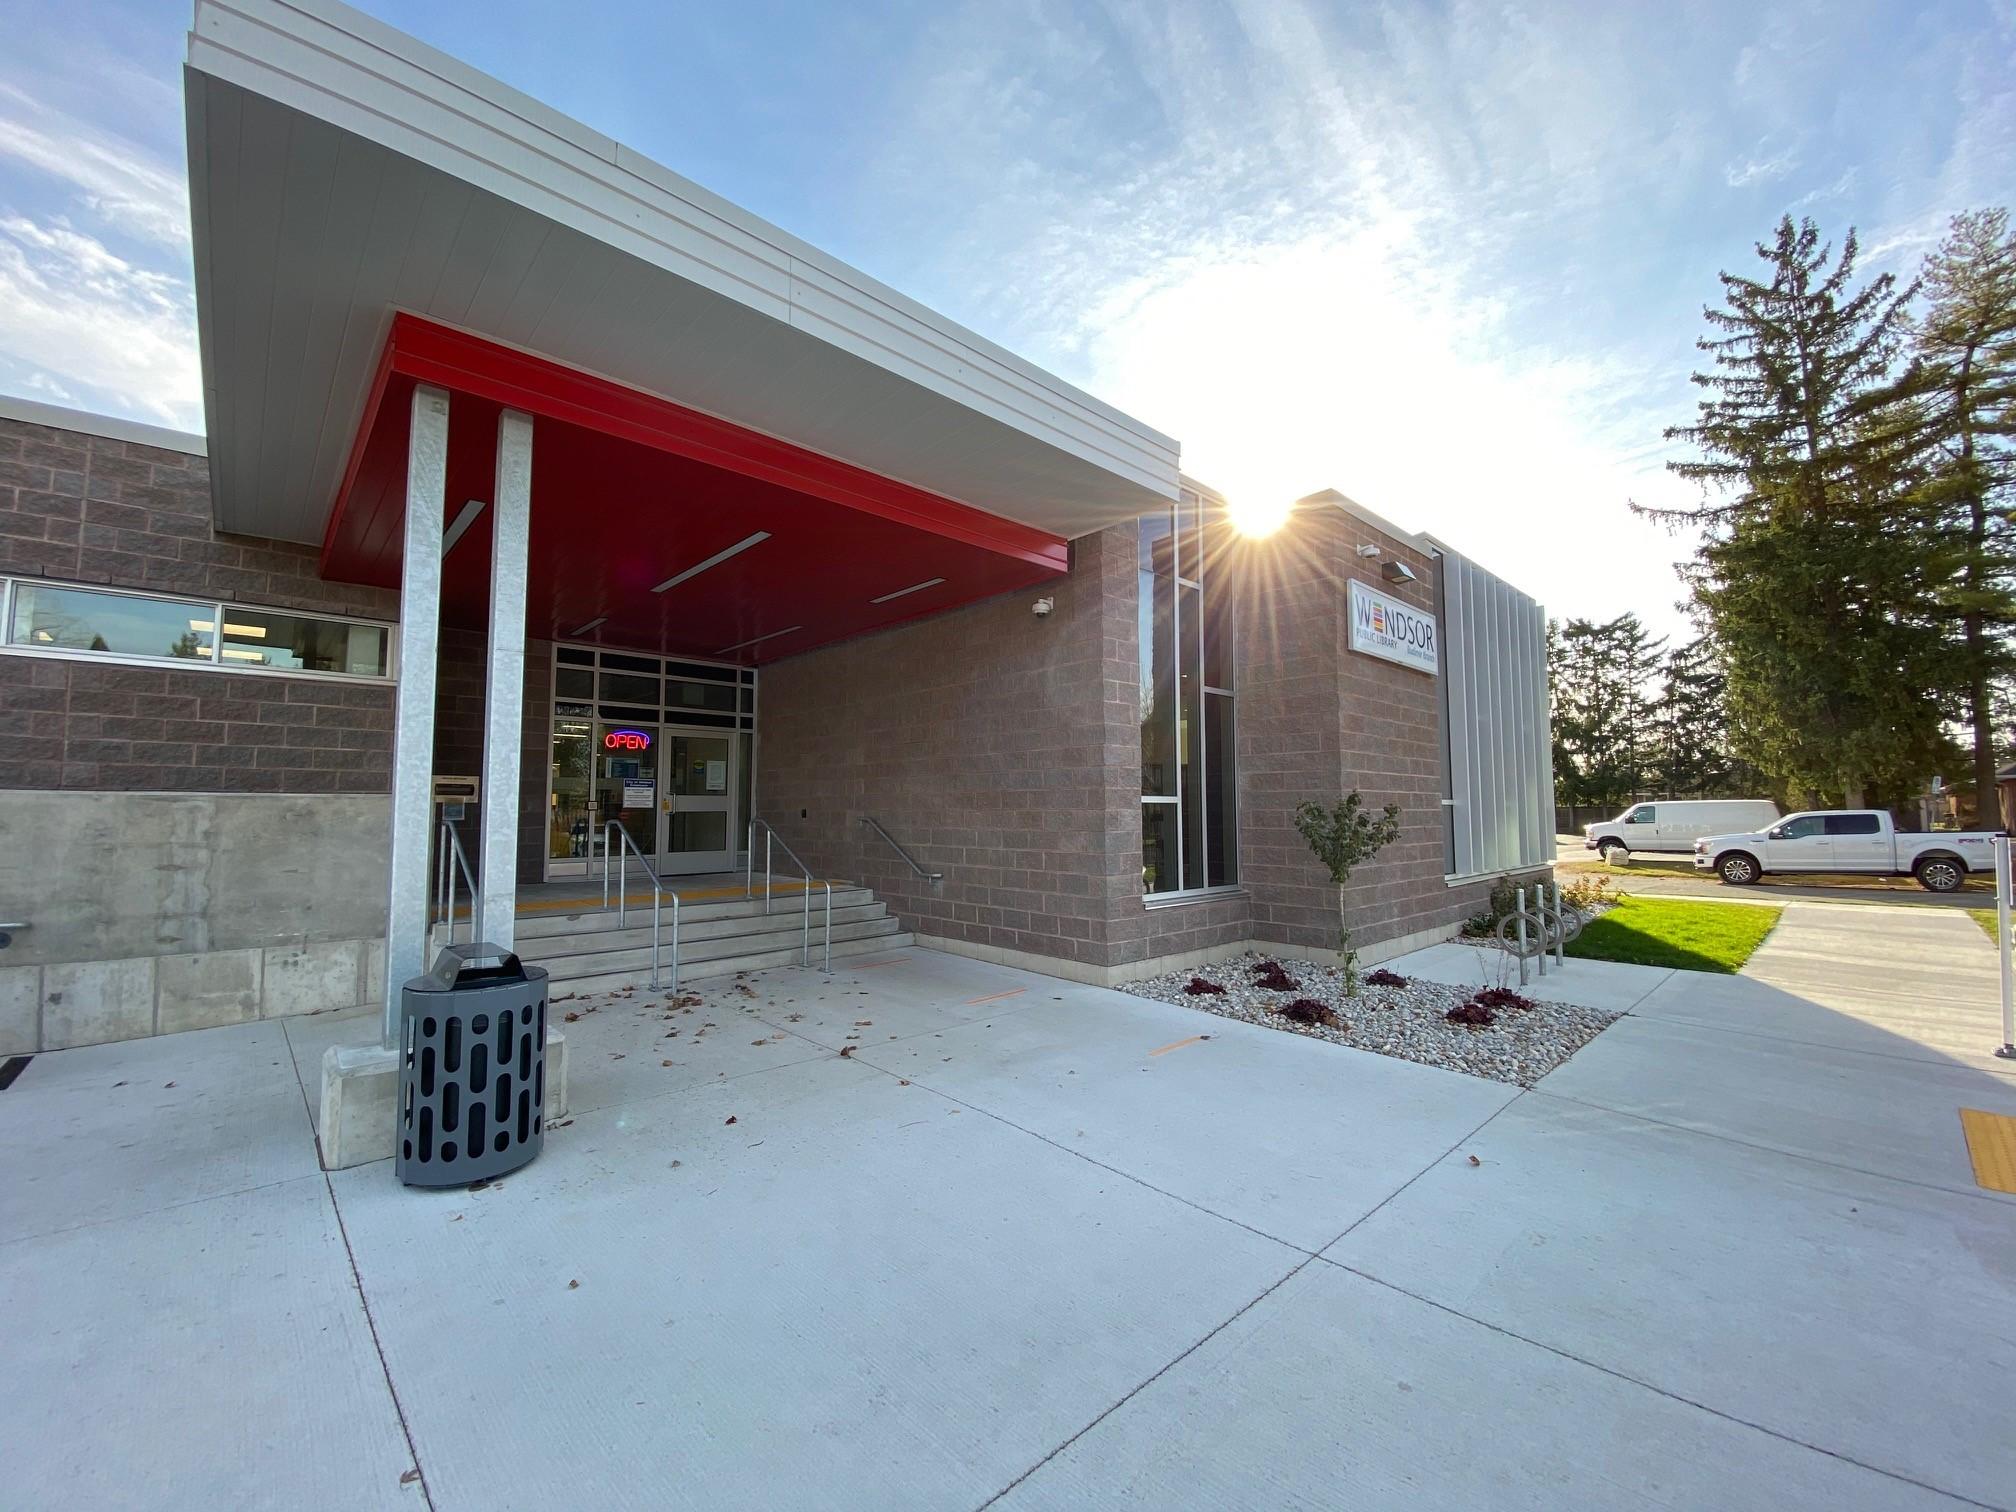 Budimir Public Library Windsor Ontario Exterior